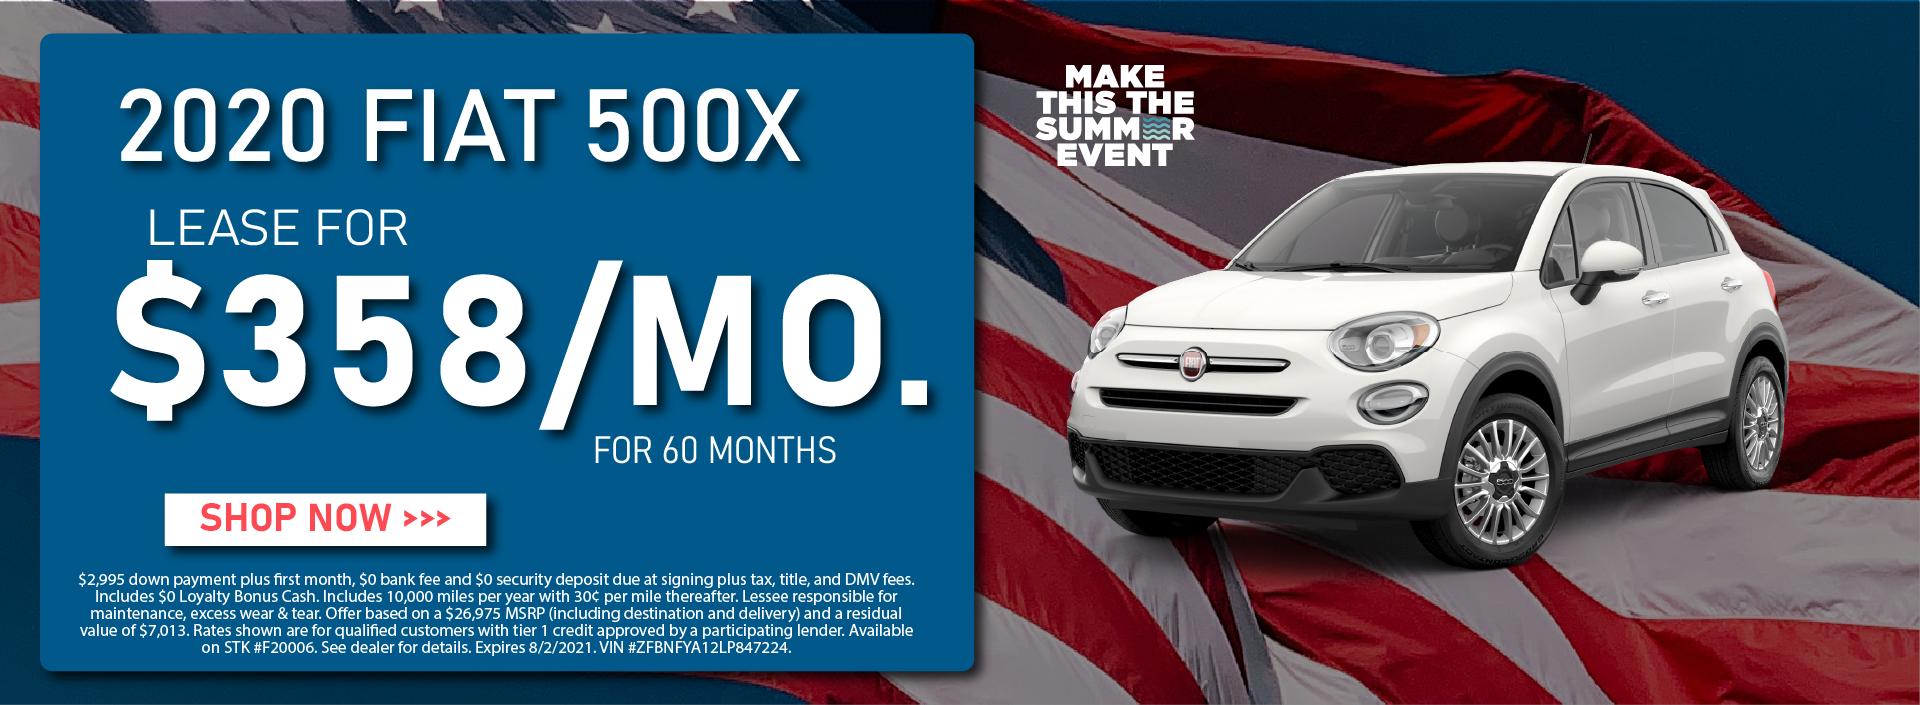 CDJR Manhattan – July 2021 – Fiat 500X – update